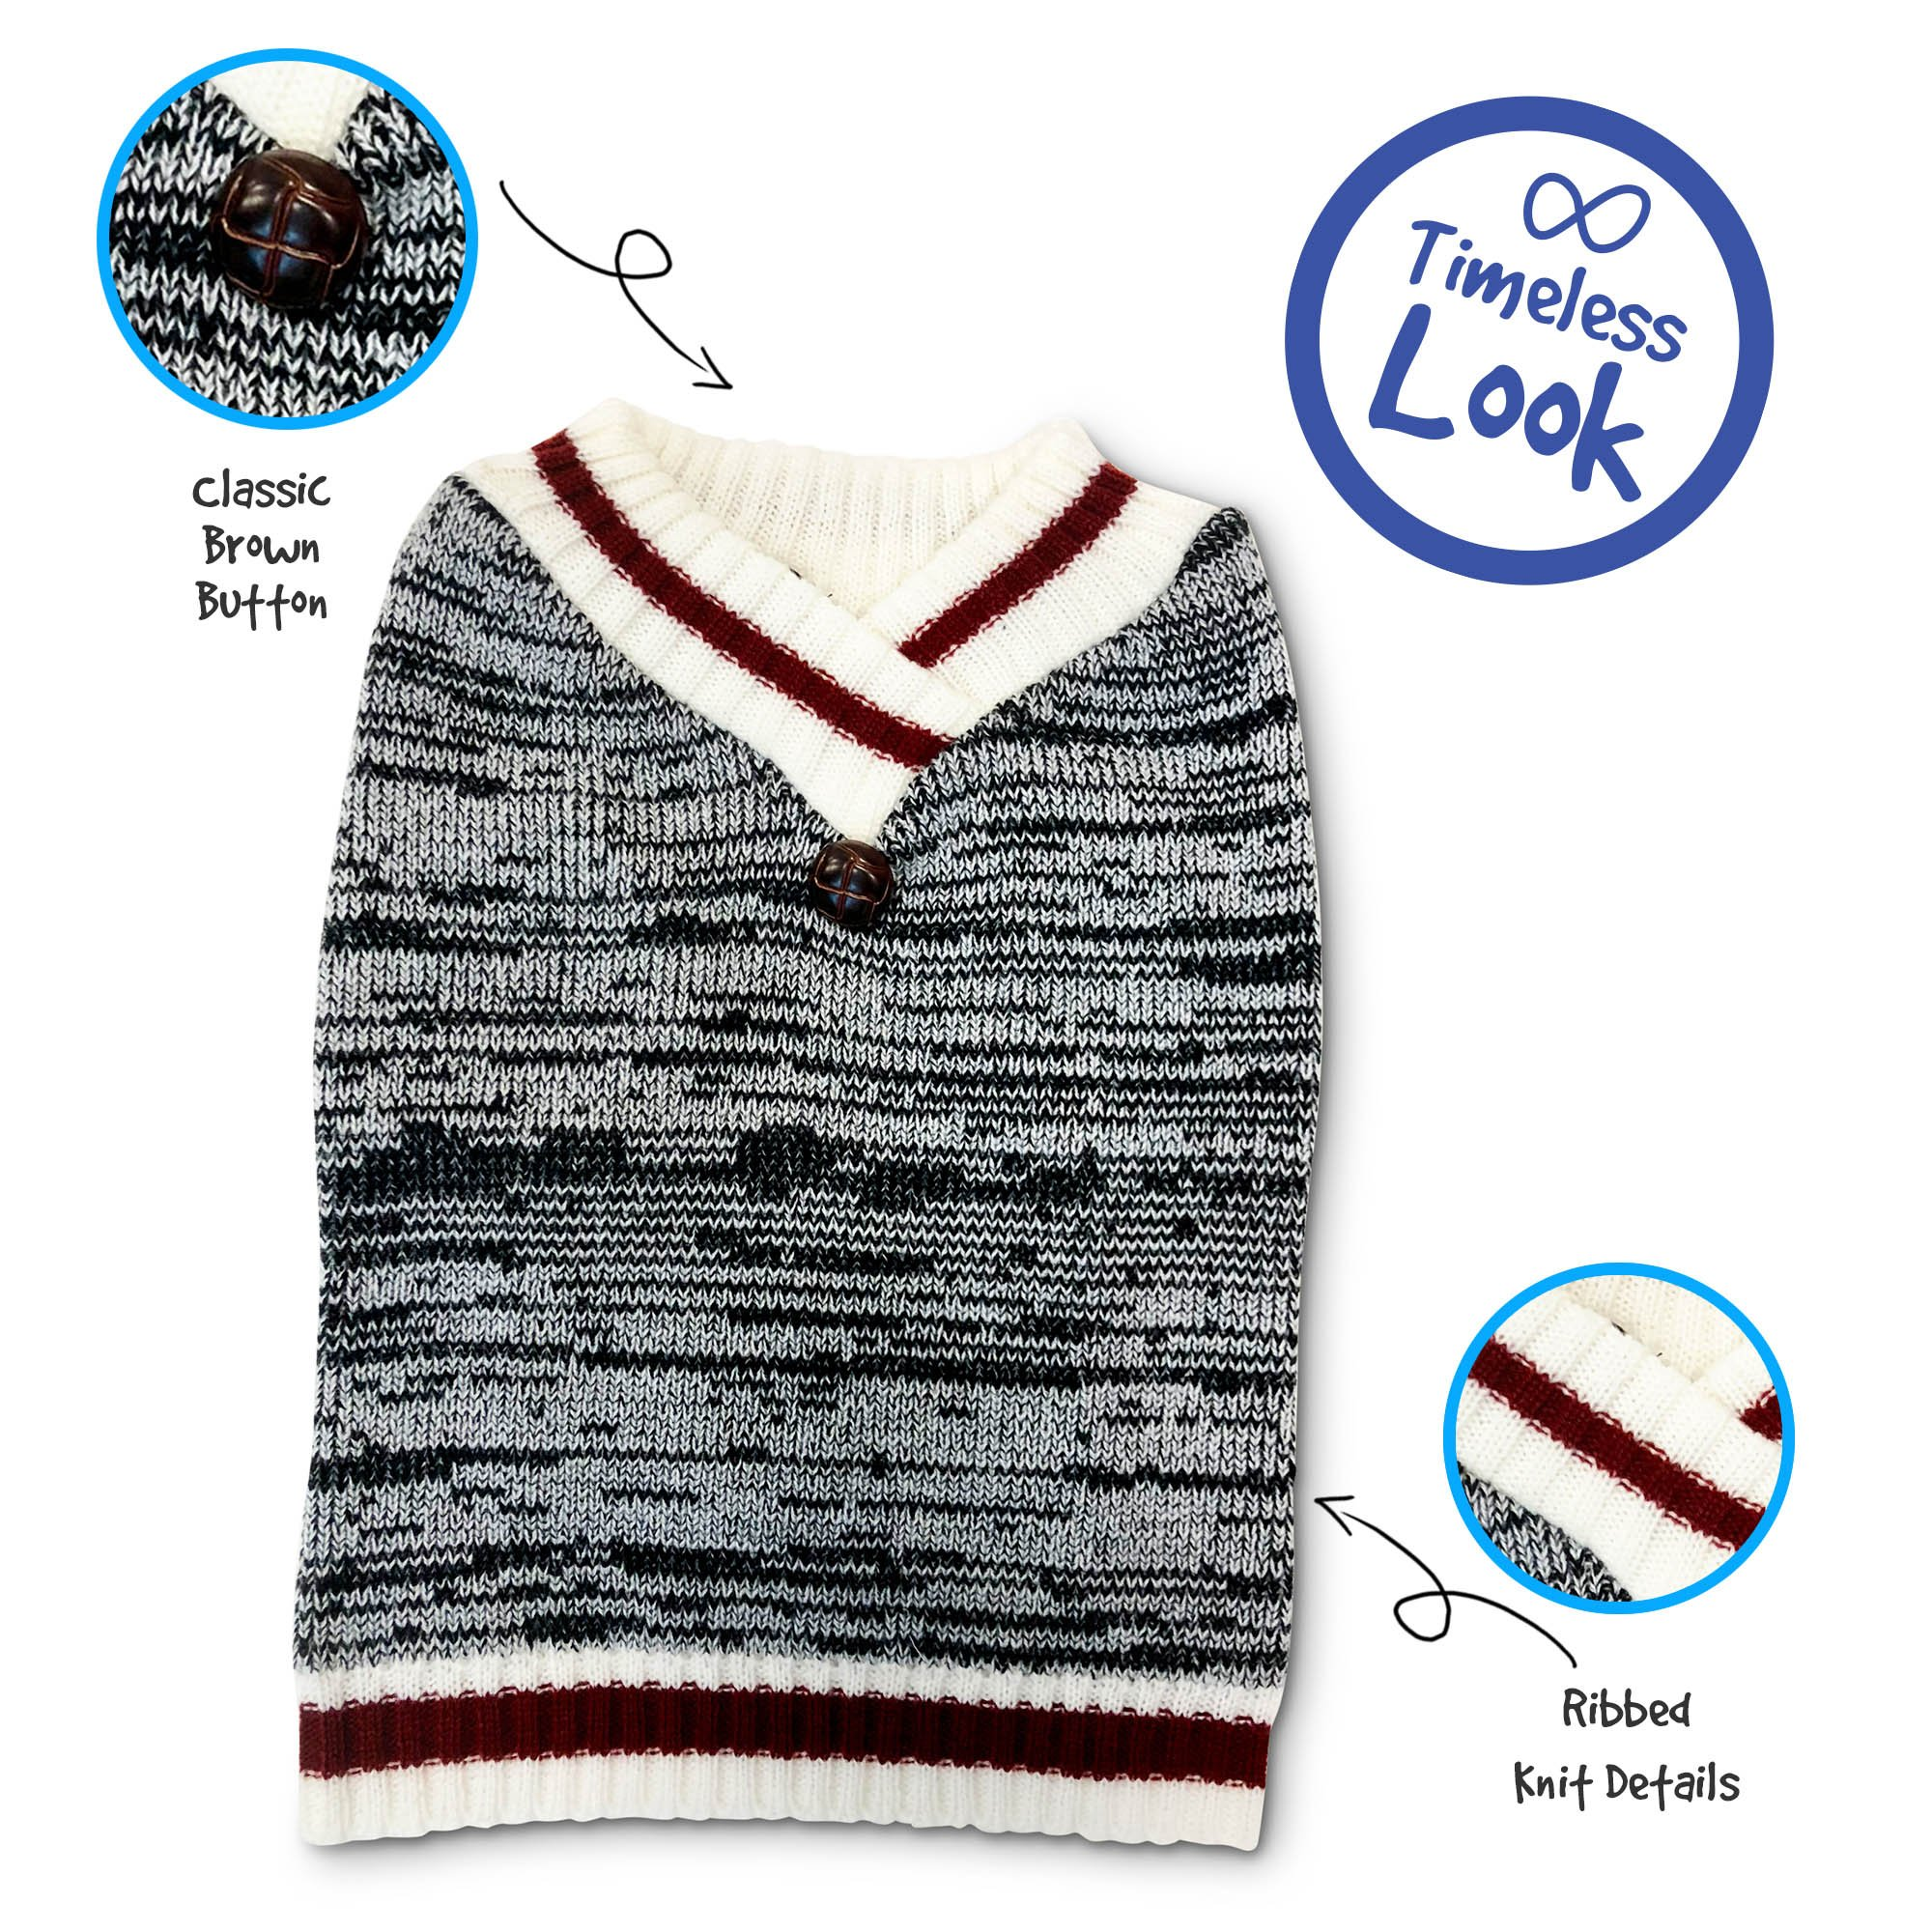 Pet Craft Supply 8973 V-nk Knit Sweater, X-Small, Burgundy